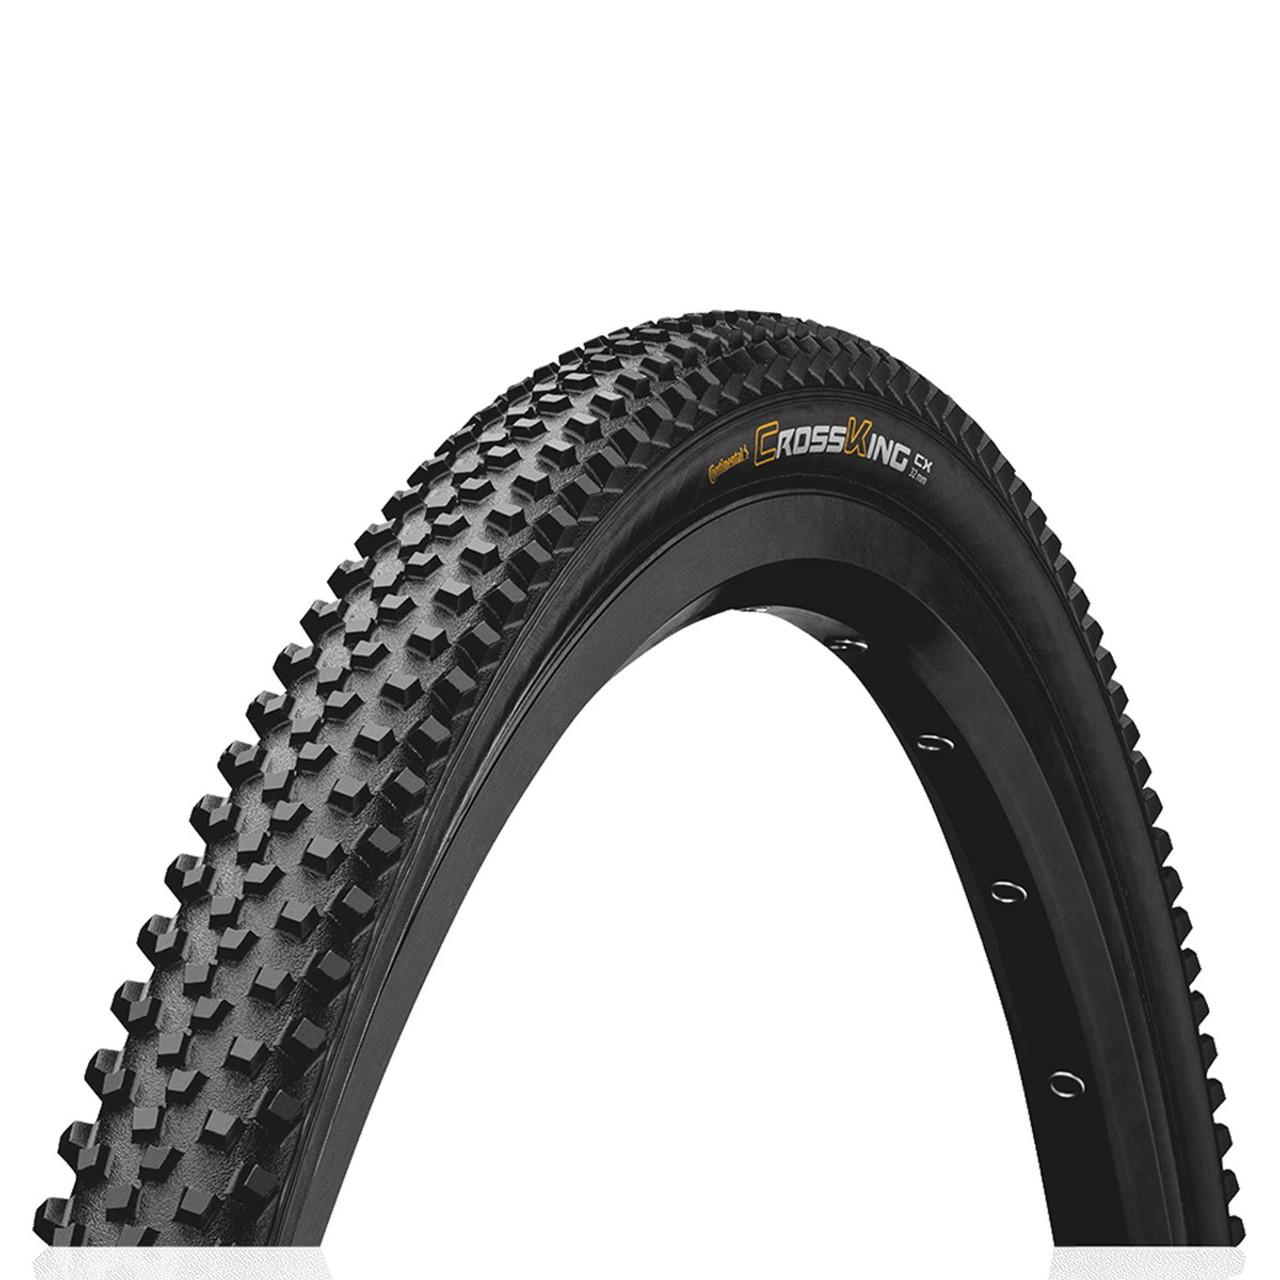 Continental Race King CX Black Chili RaceSport Folding Tyre 700 x 32